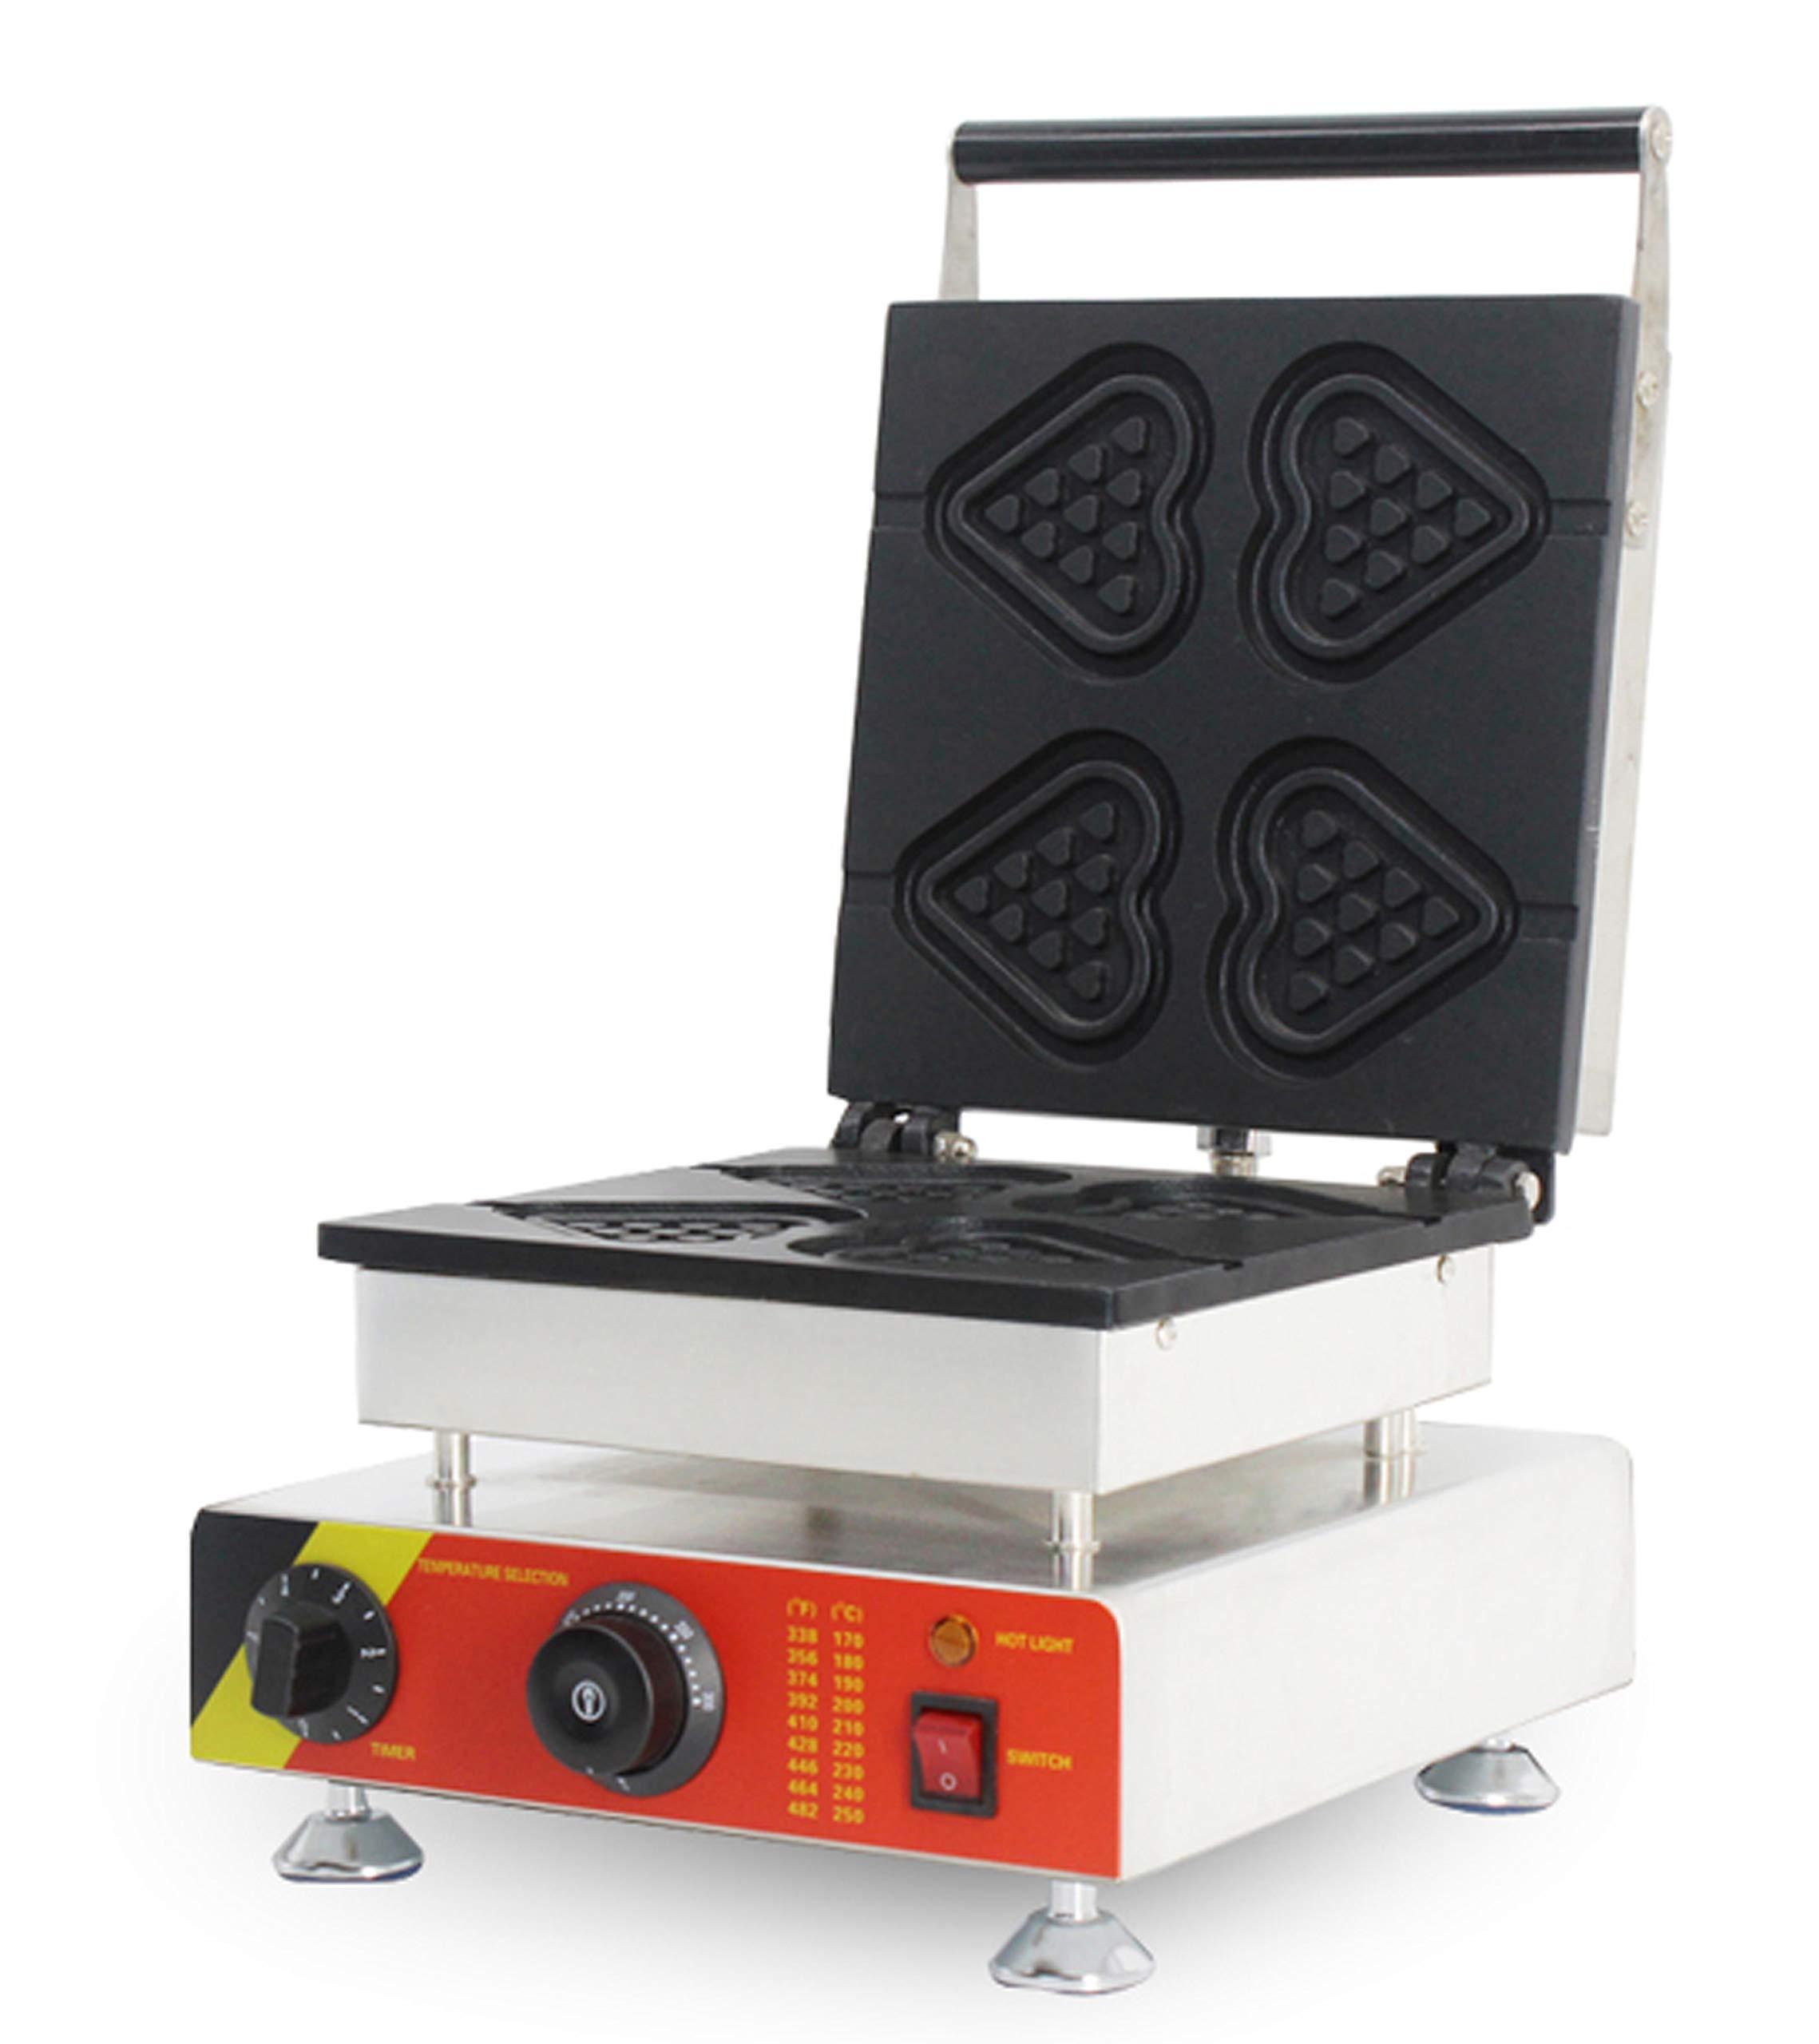 Hanchen NP-511 4pcs Commercial Waffle Maker Electric Waffle Machine No-stick Belgian Waffle Baker 110V/220V (Heart-shape)